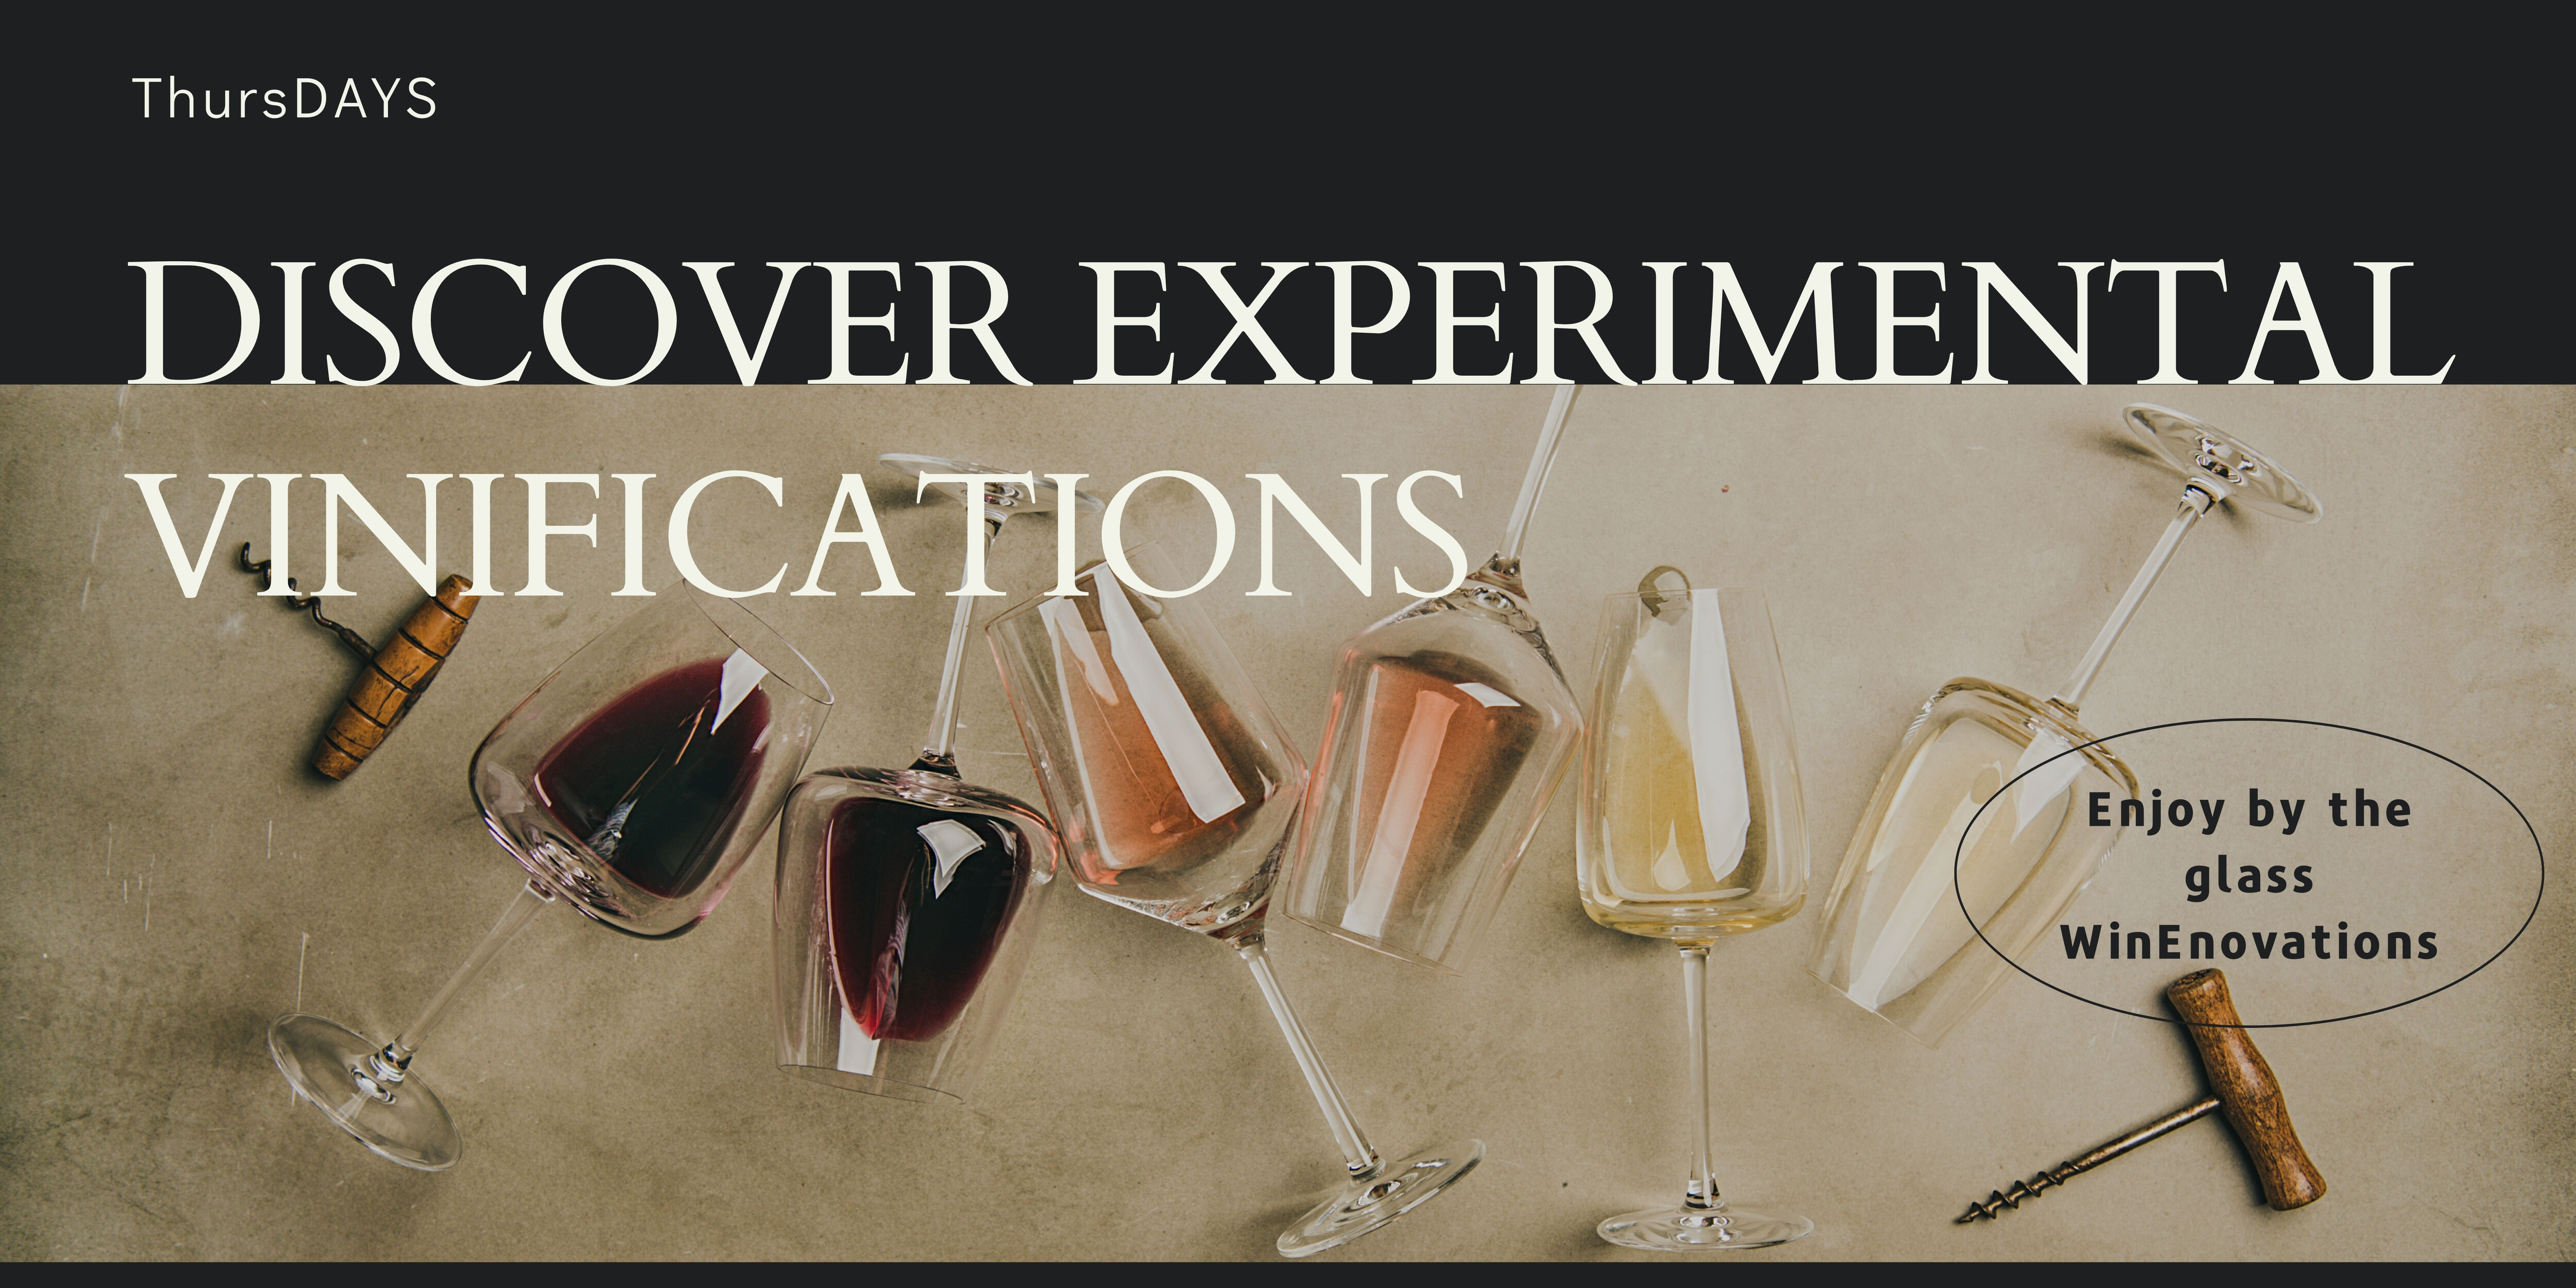 best wine greek event athens